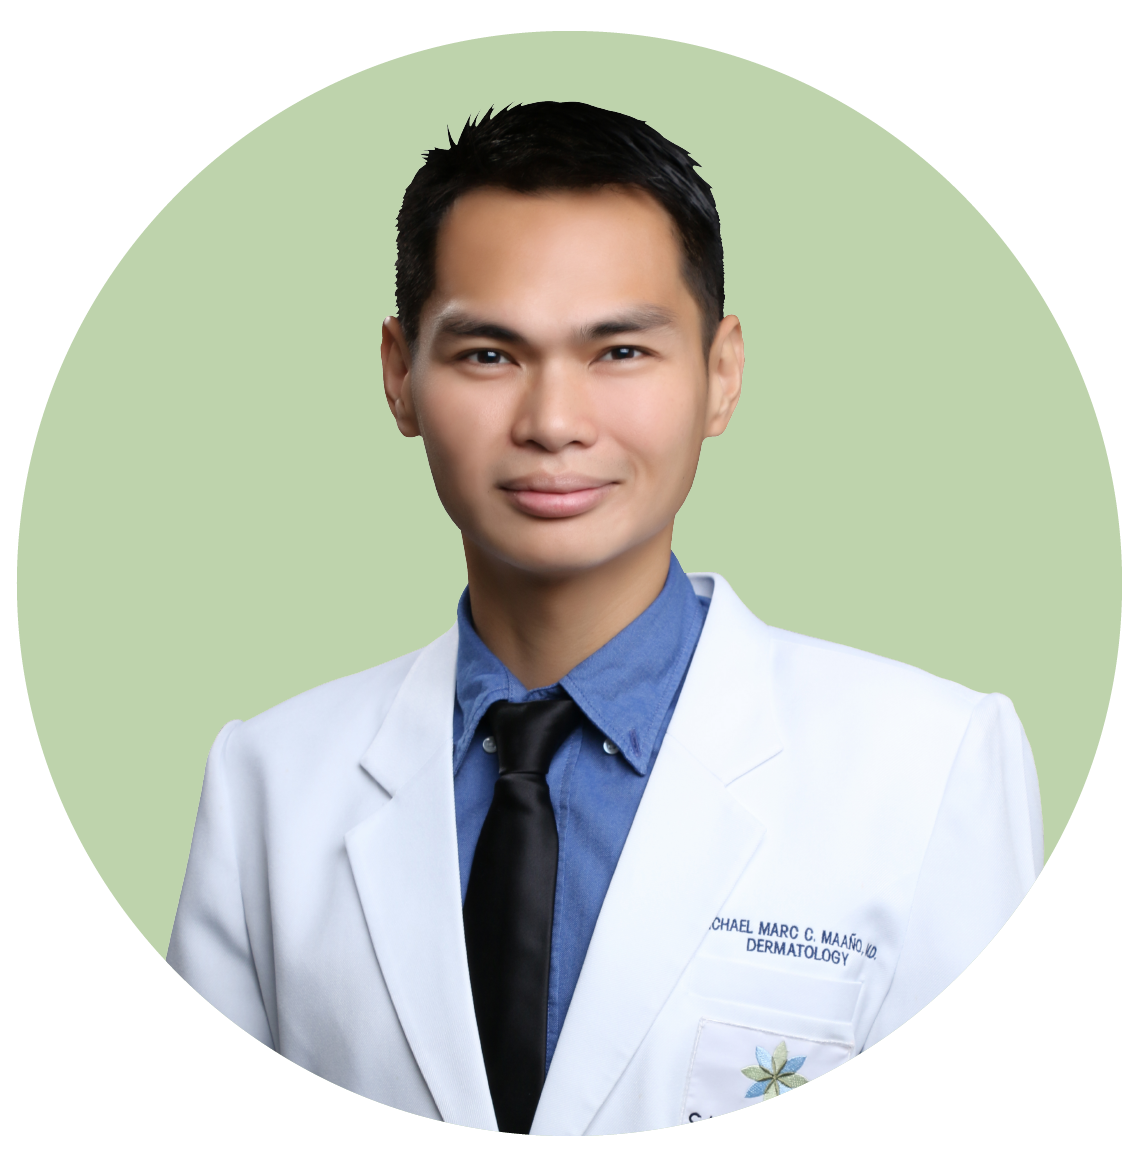 Michael Marc Cruz Maaño - Best Dermatologist